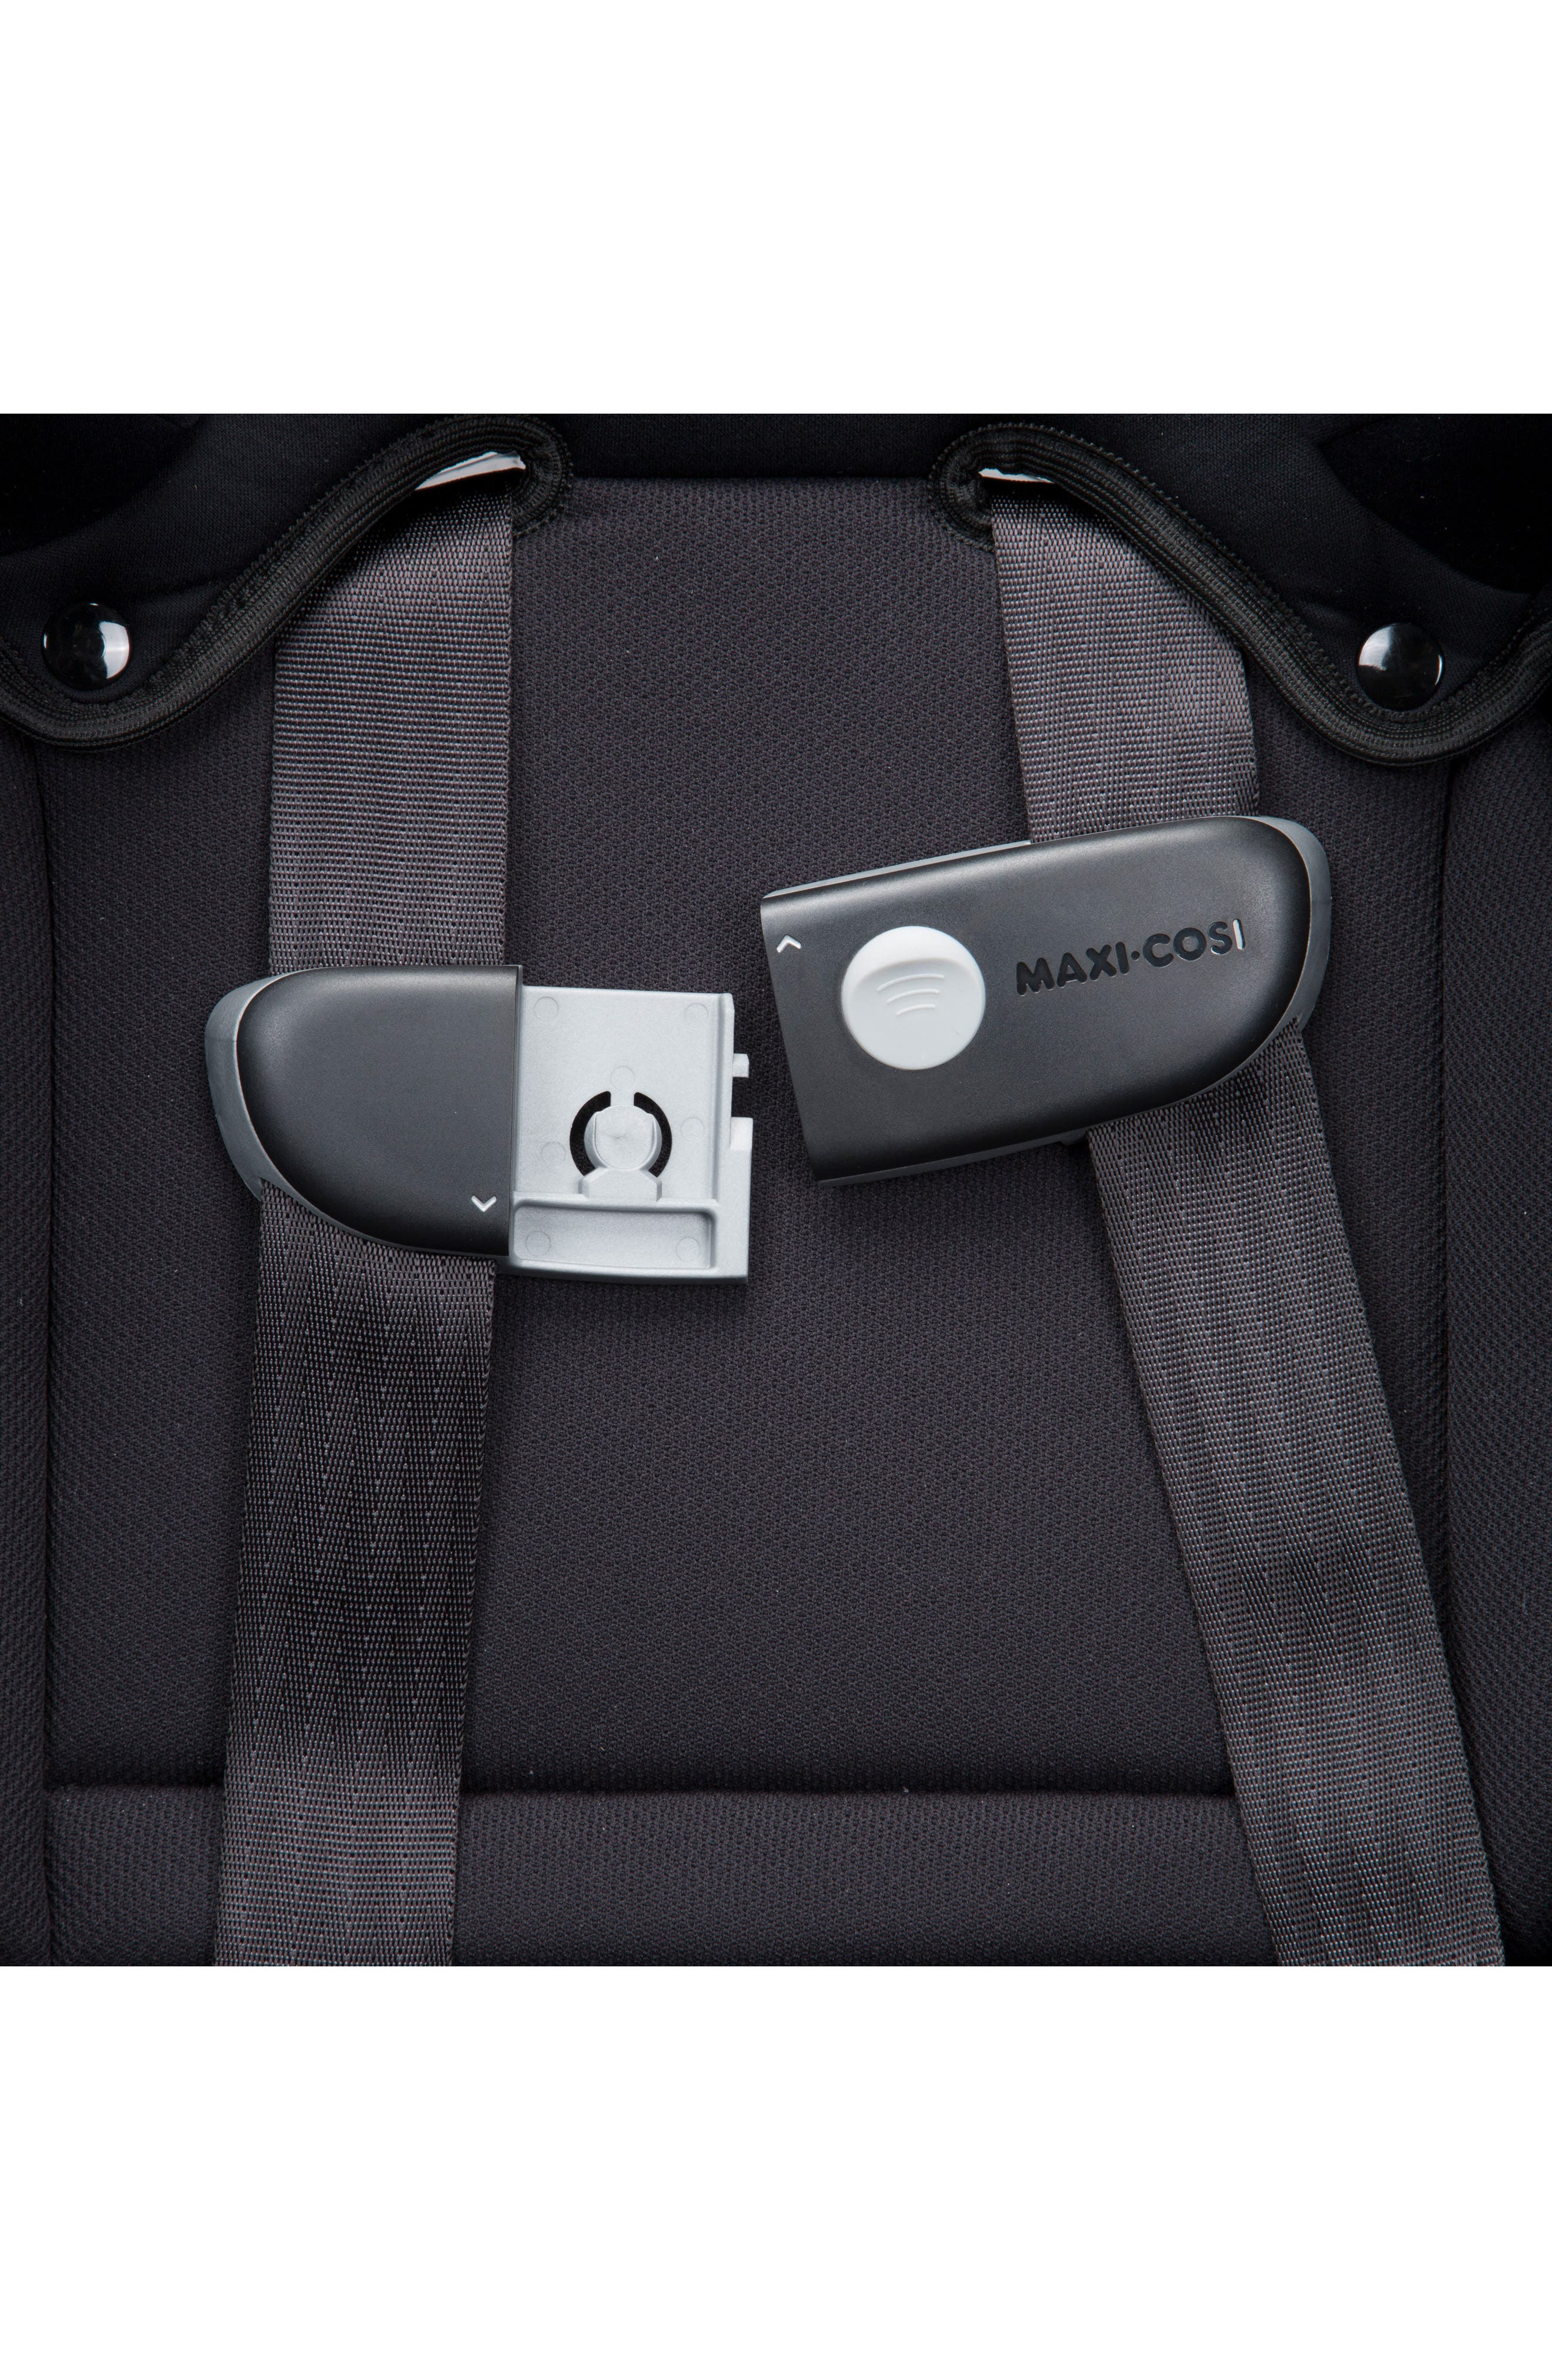 Pria<sup>™</sup> 85 Max Convertible Car Seat,                             Alternate thumbnail 9, color,                             Night Black